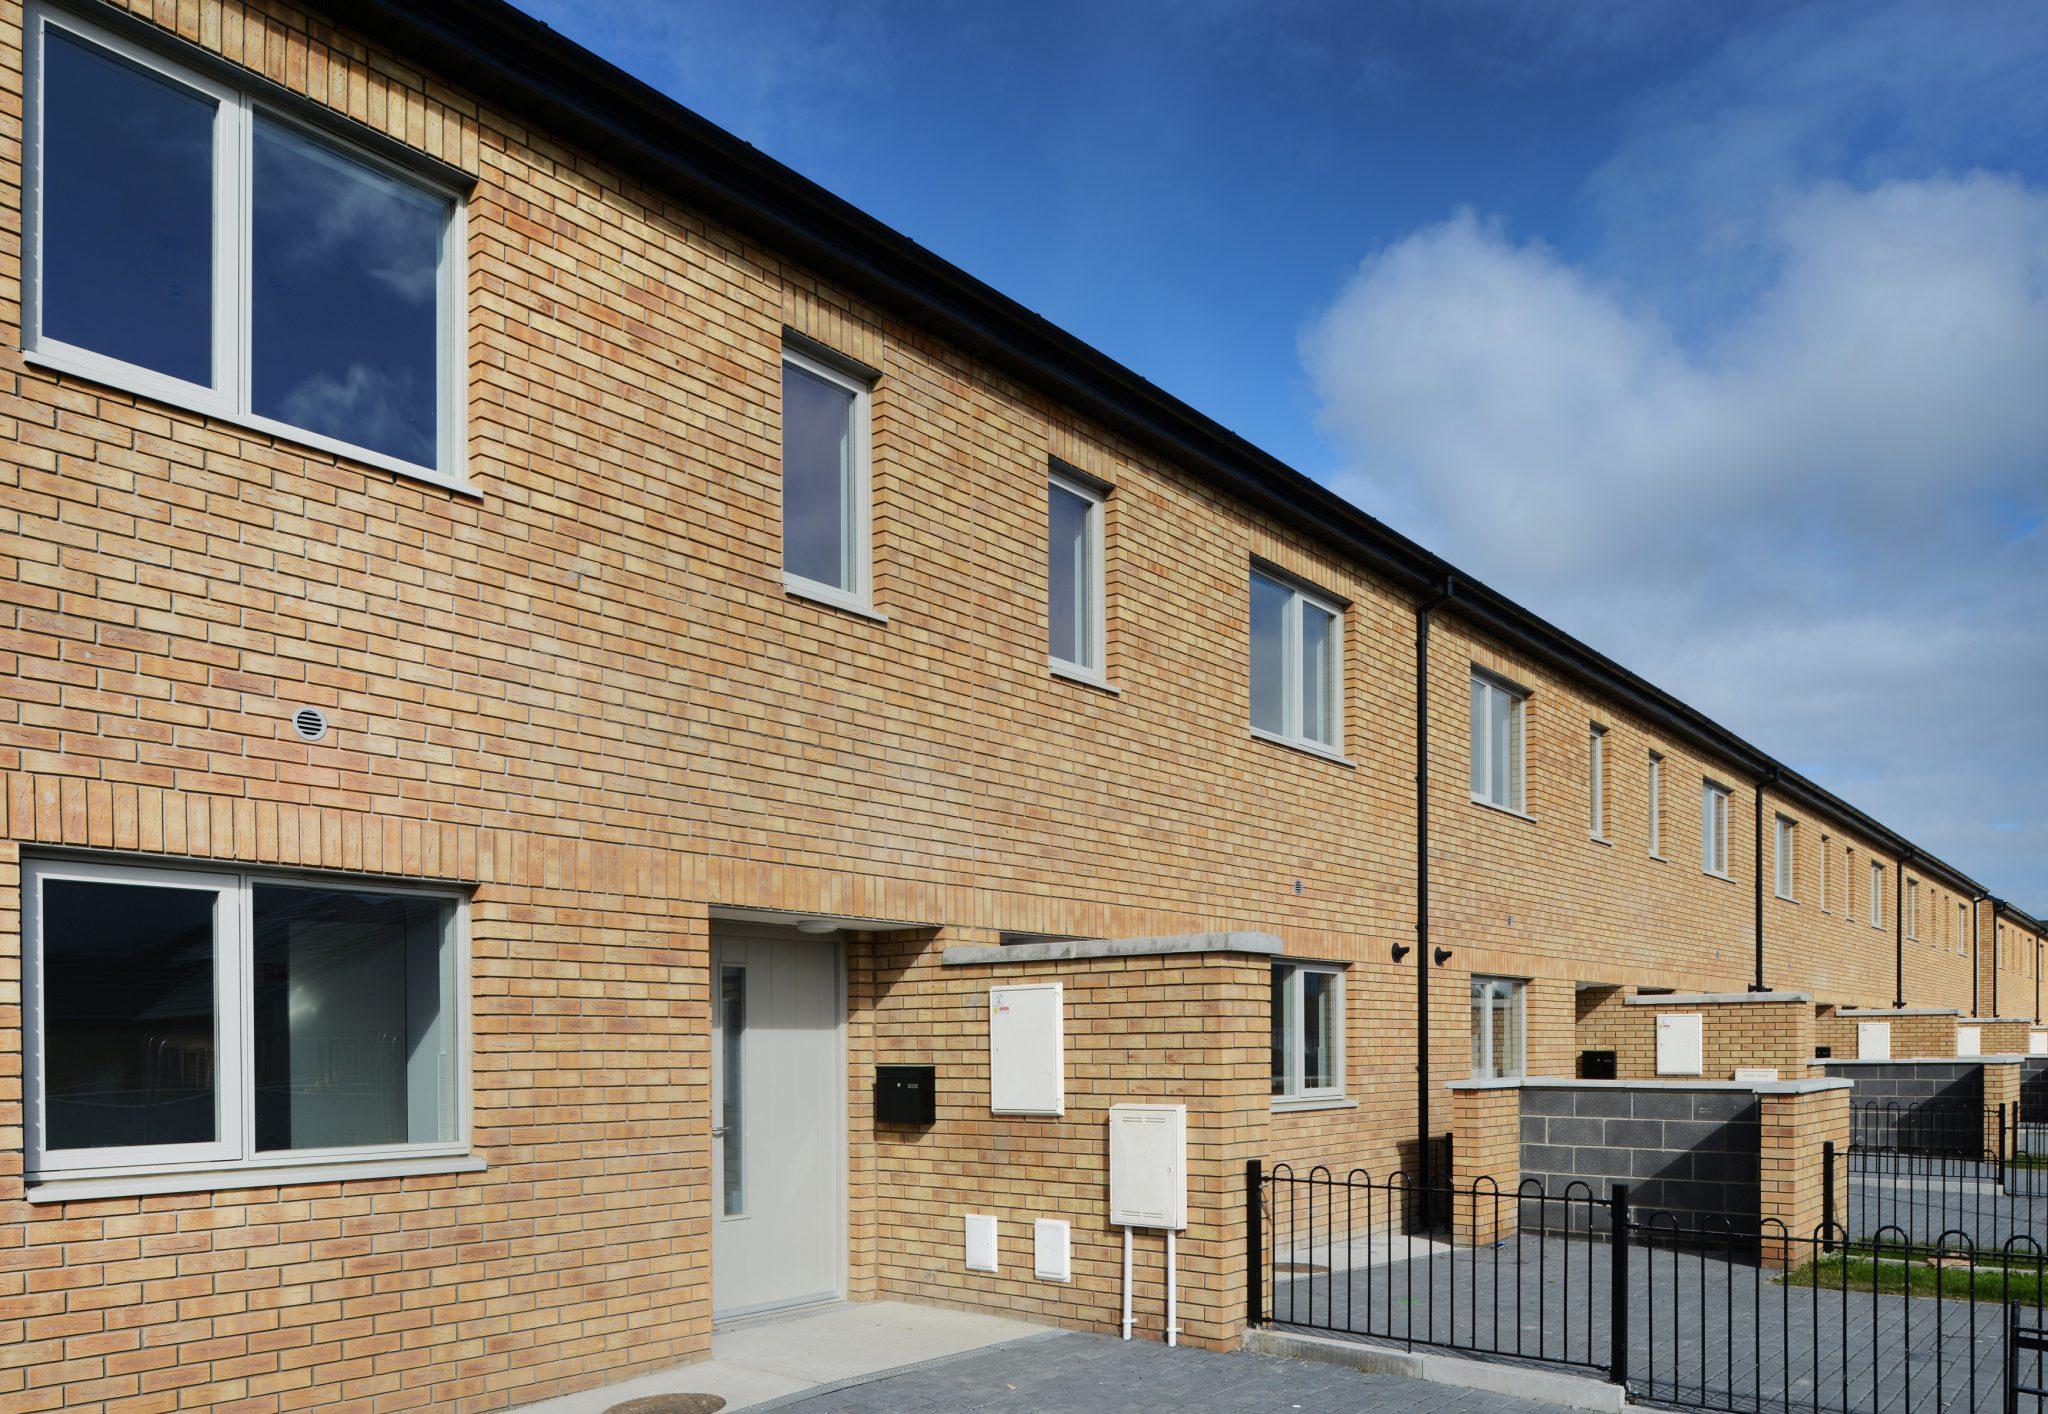 Rapid Housing Units, Cherry Orchard, Dublin 10 for Dublin City Council gallery